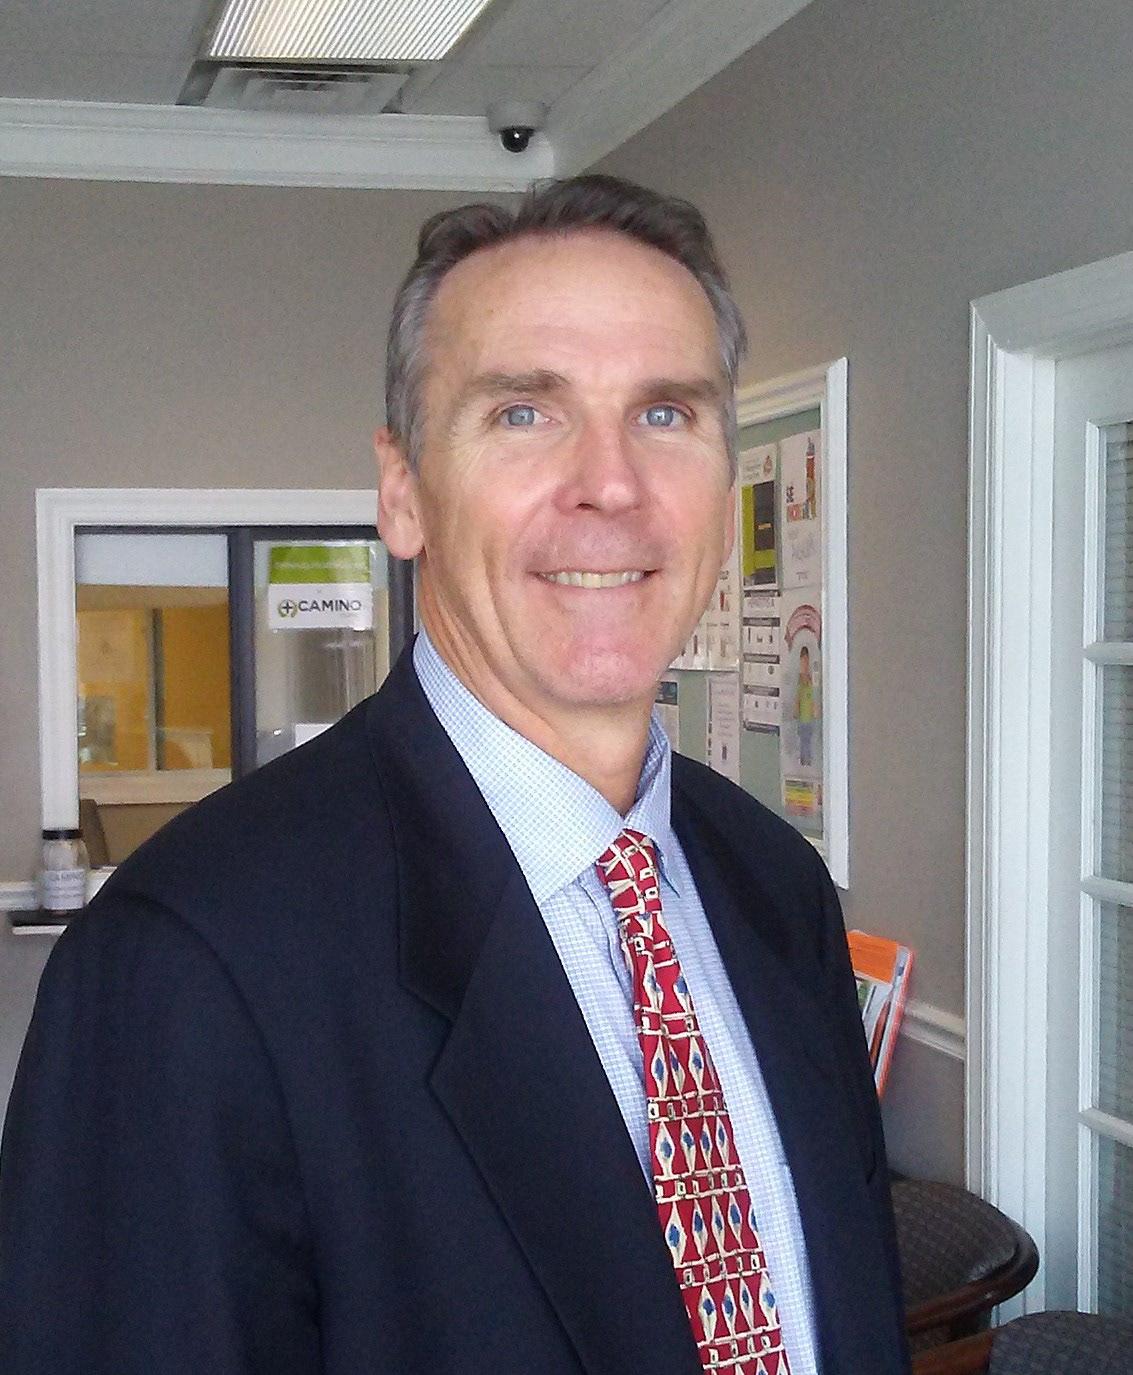 Peter Schieffelin Nyberg